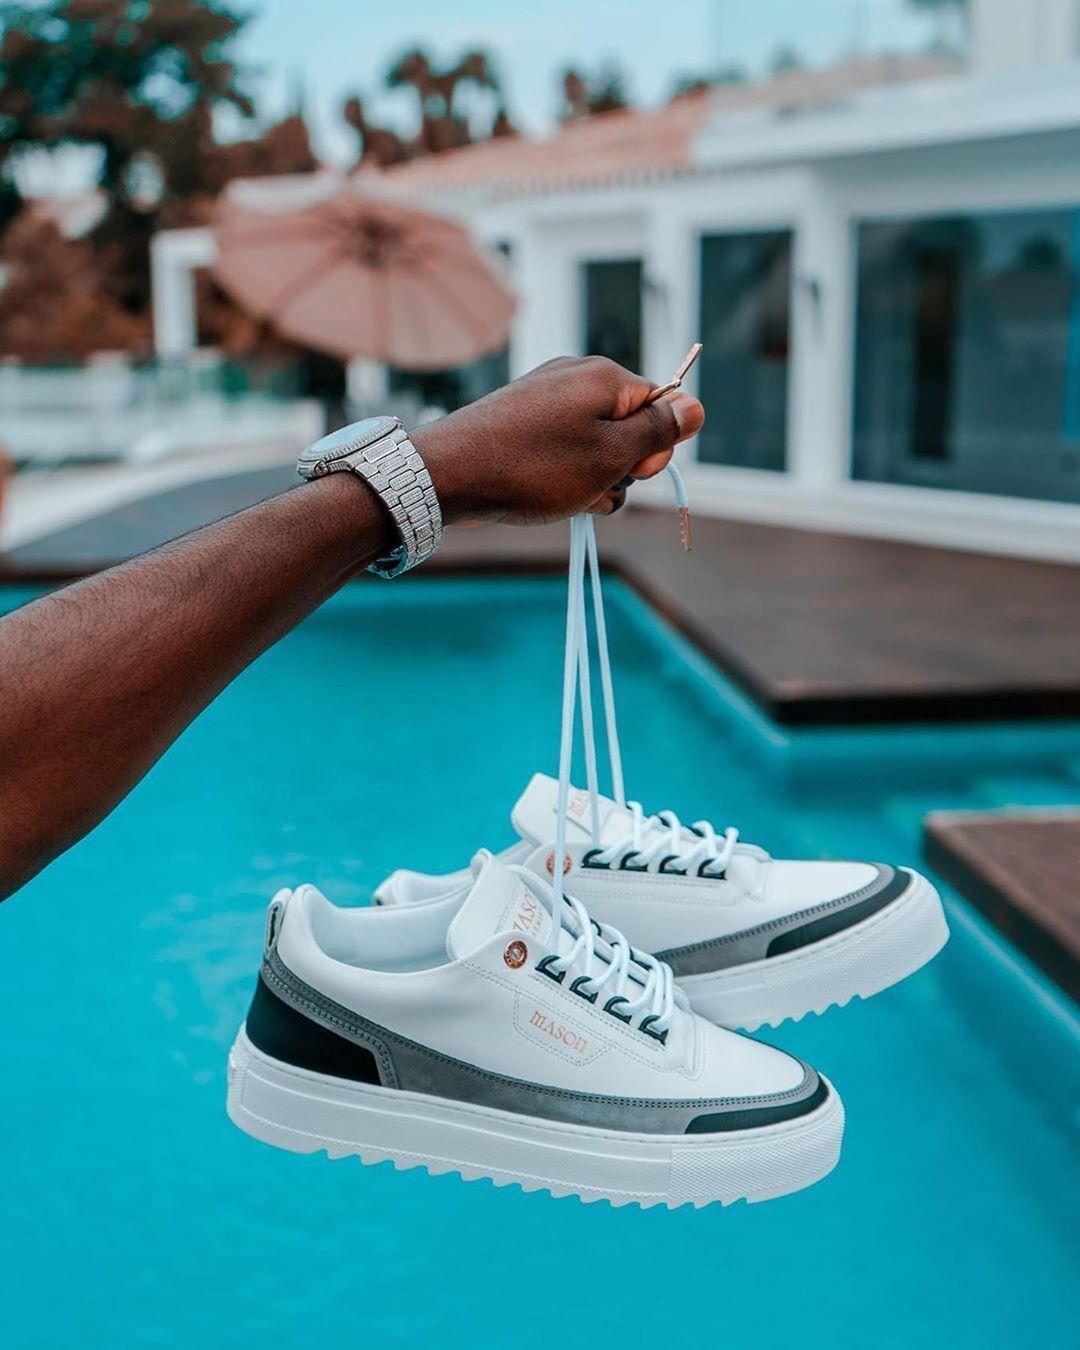 Mason garments, Sneakers fashion